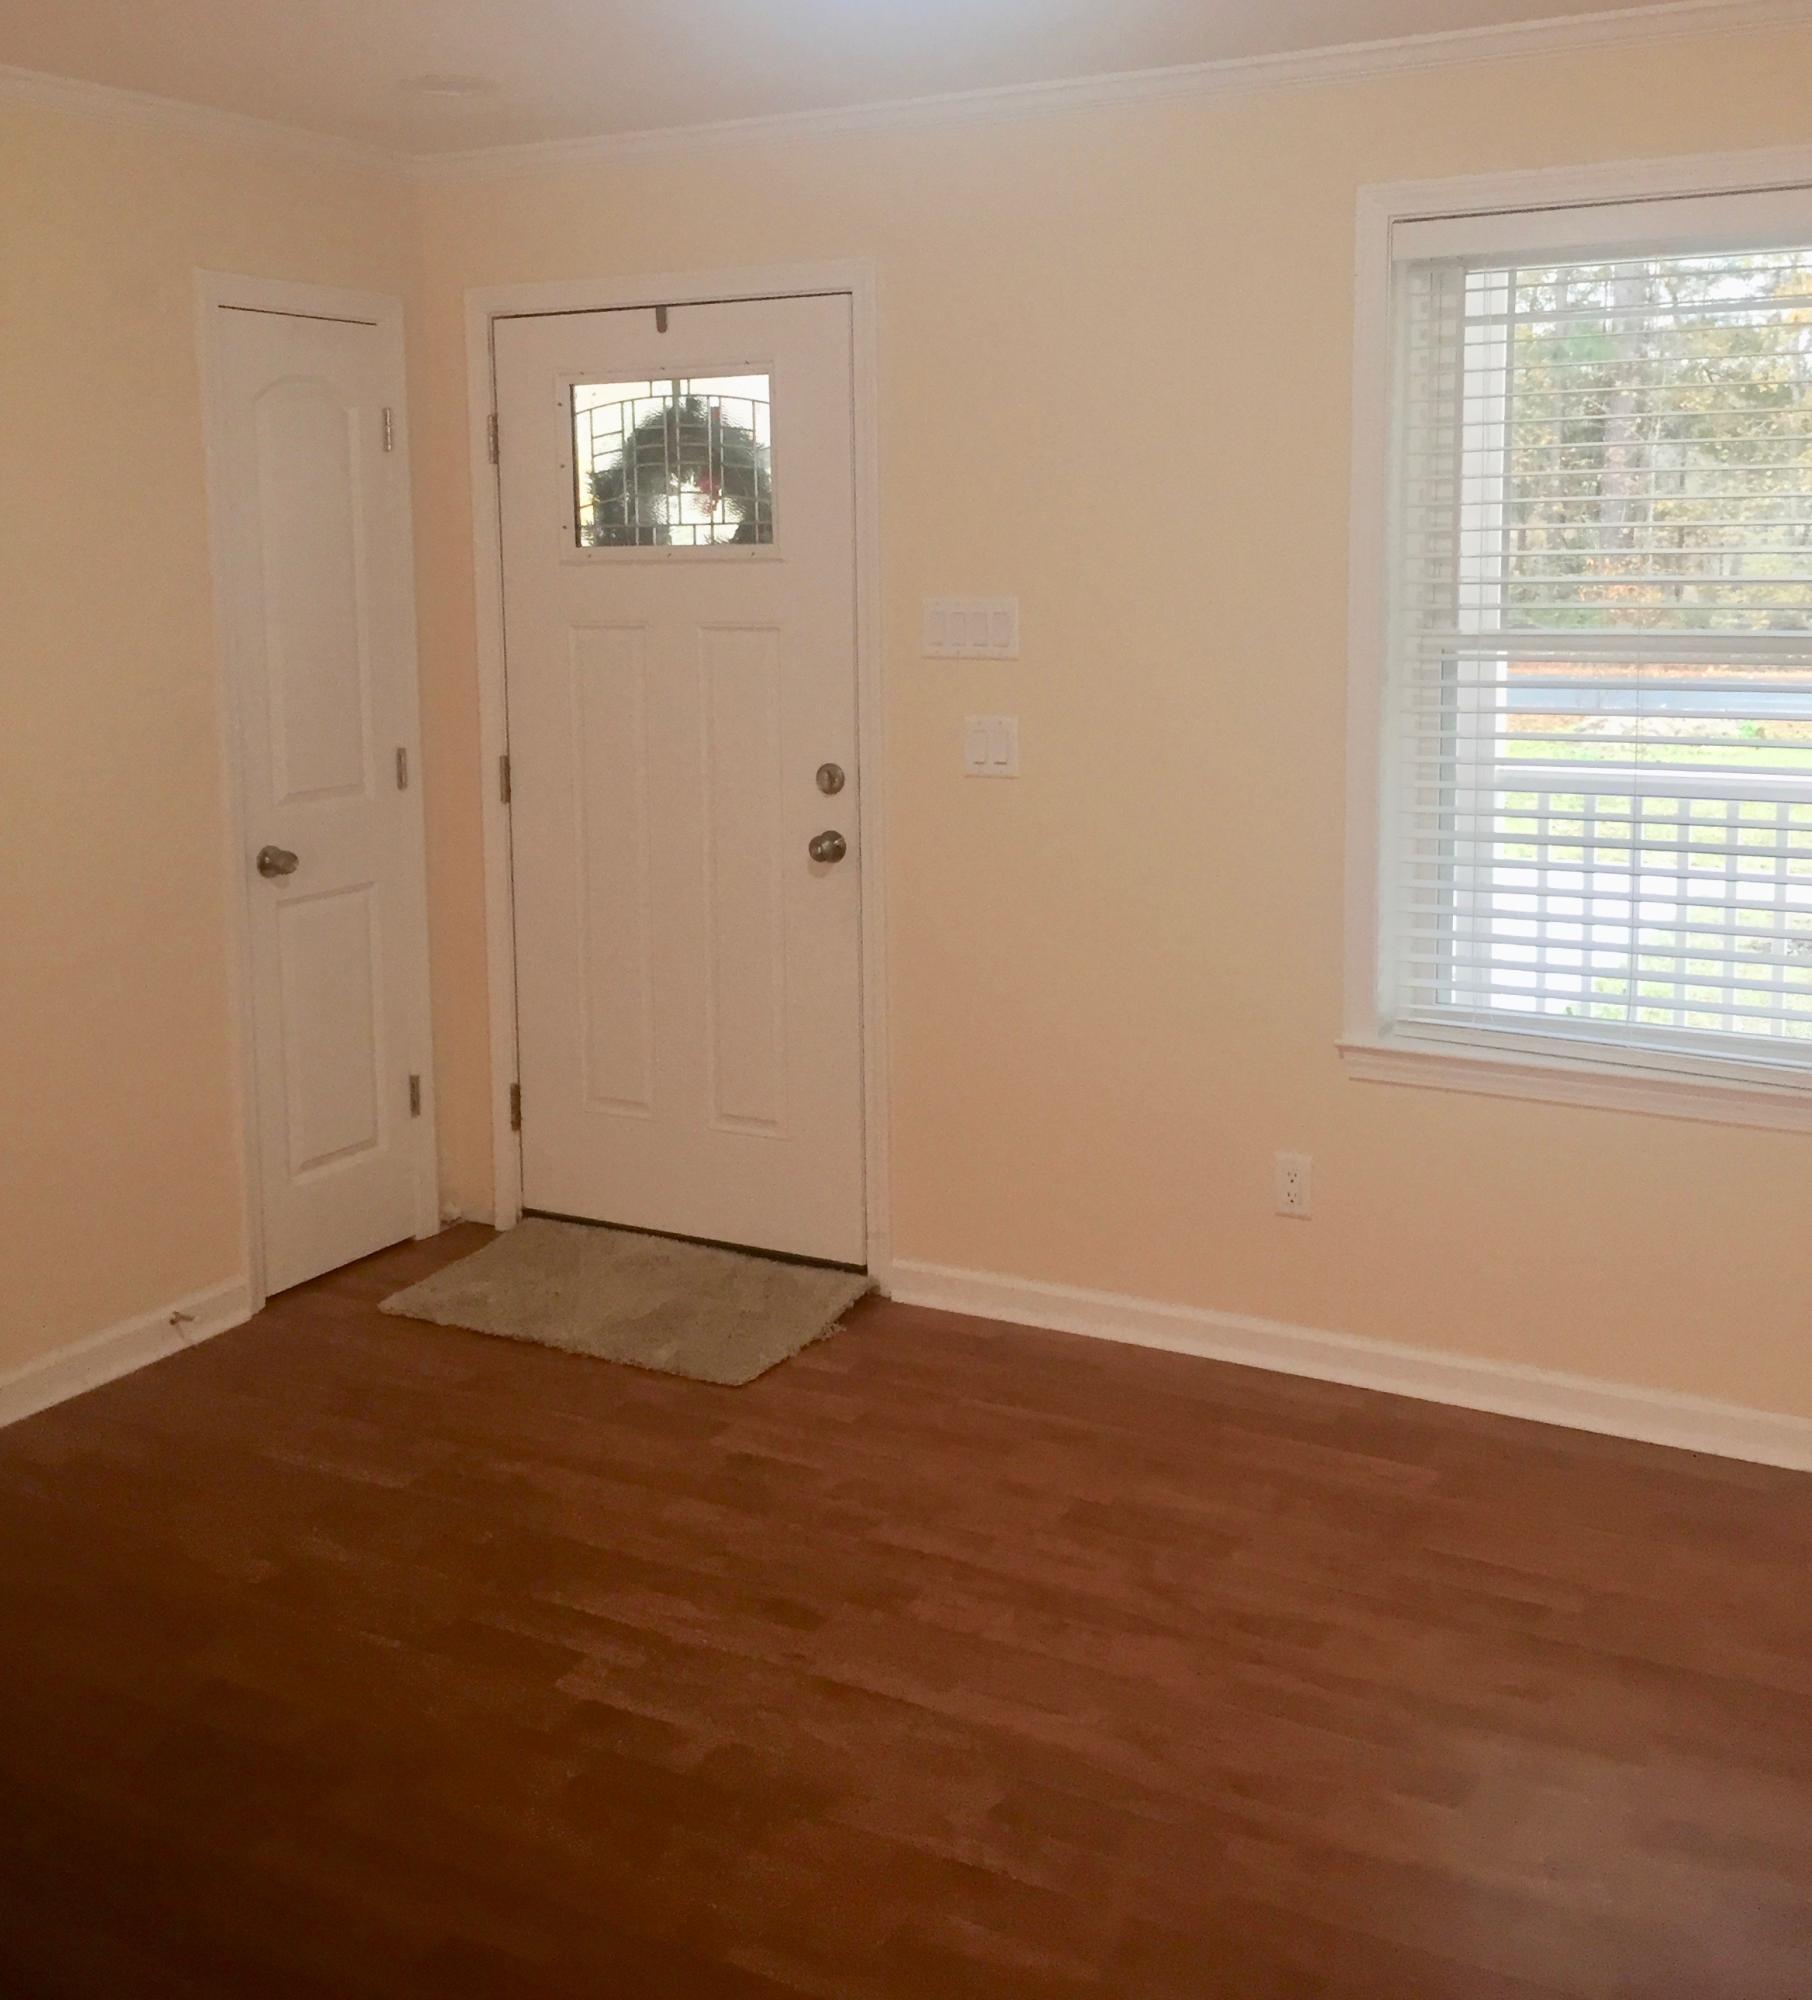 None Homes For Sale - 579 Dopson, Islandton, SC - 5